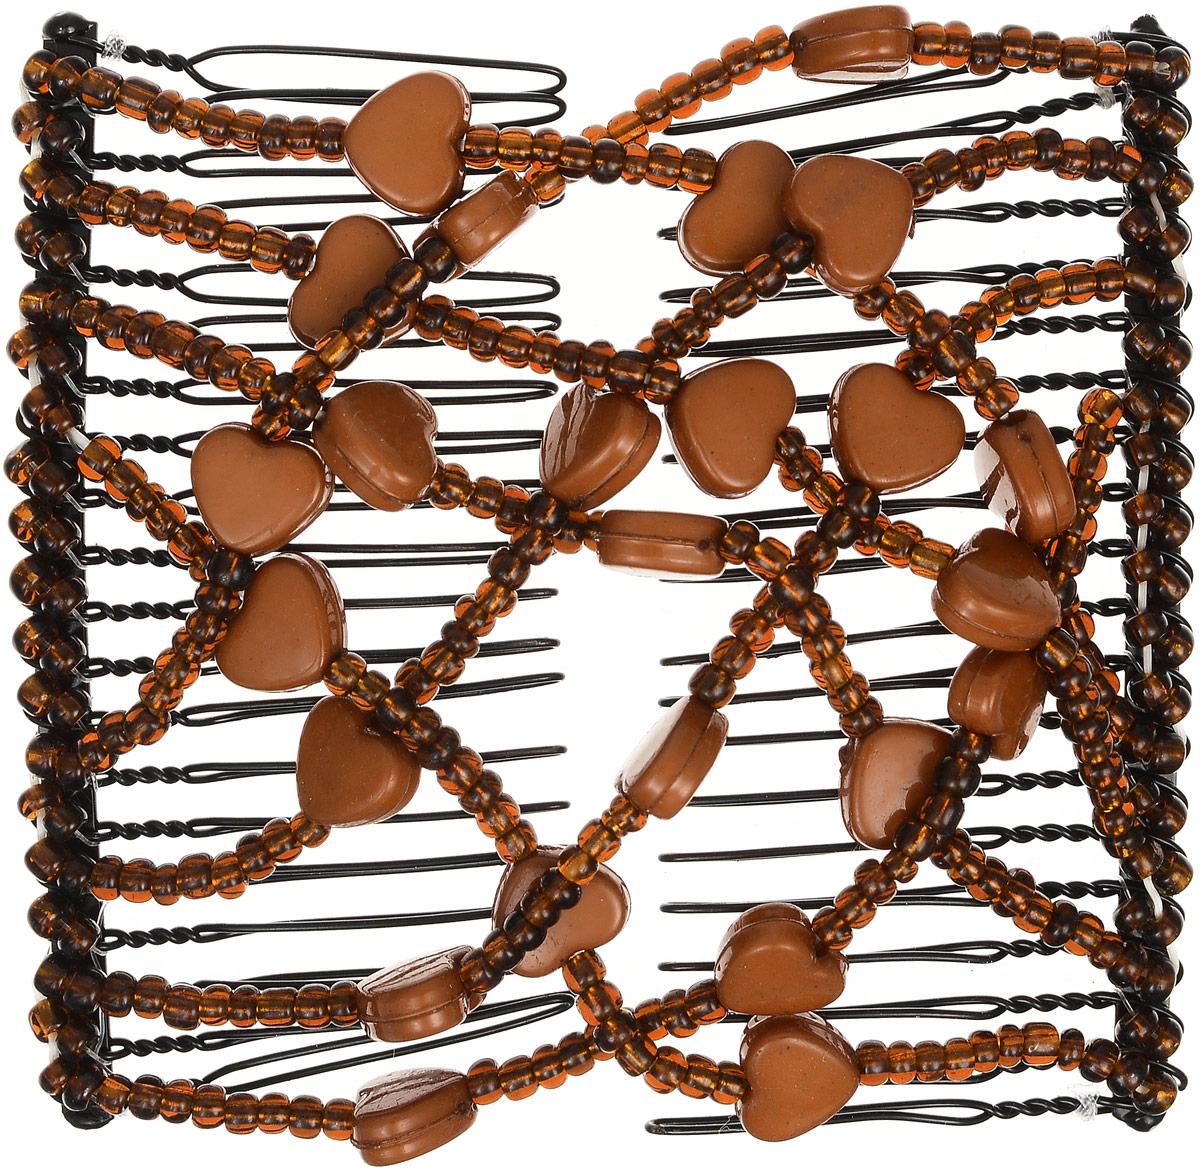 EZ-Combs Заколка Изи-Комбс, одинарная, цвет: коричневый. ЗИО_сердечки